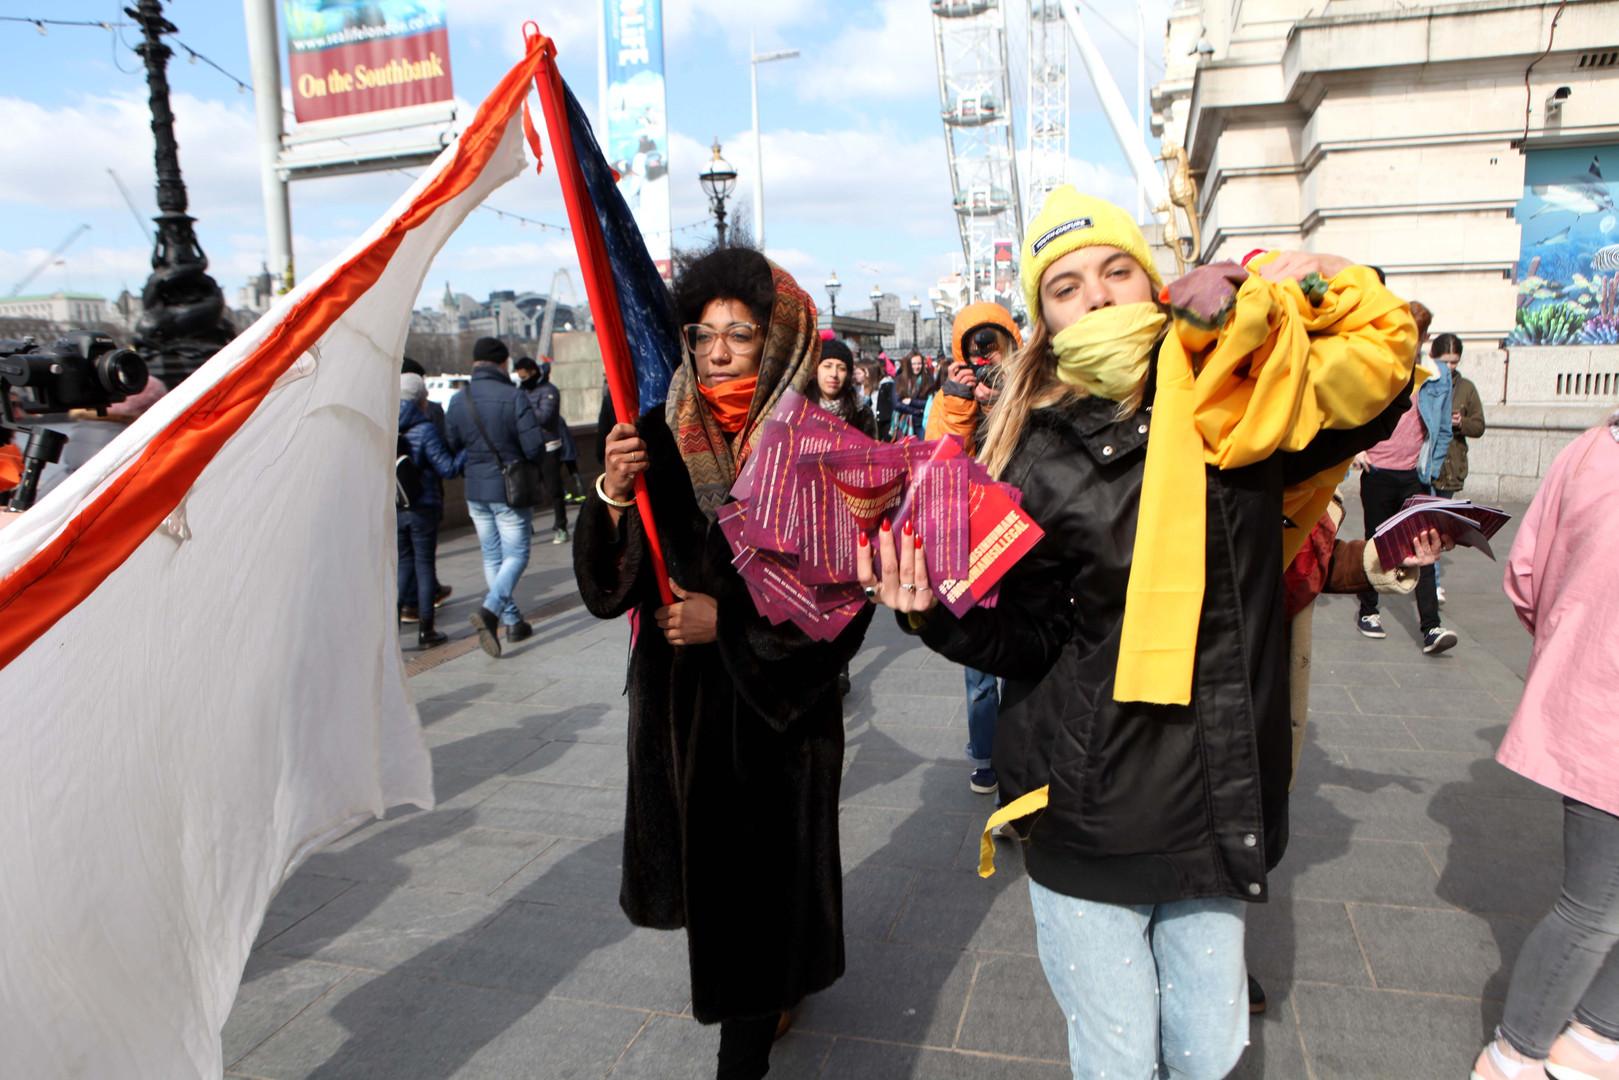 Yarlswood Activists on Westminster Bridge